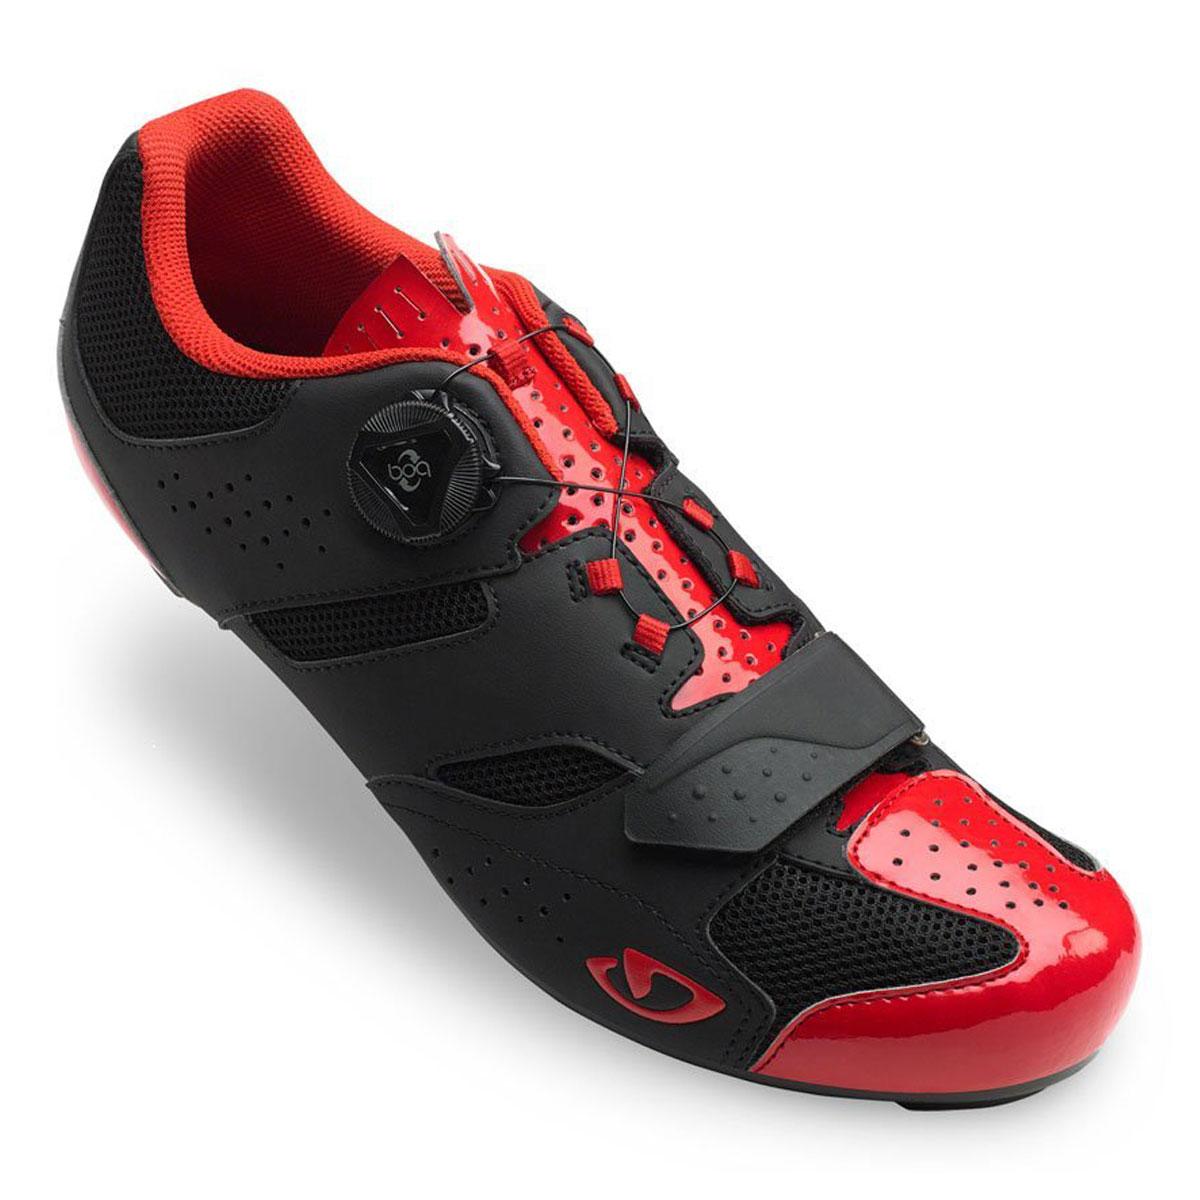 Giro Savix Route Vélo Cyclisme Chaussures Blanc Taille UK9//EU43 RRP £ 114.99